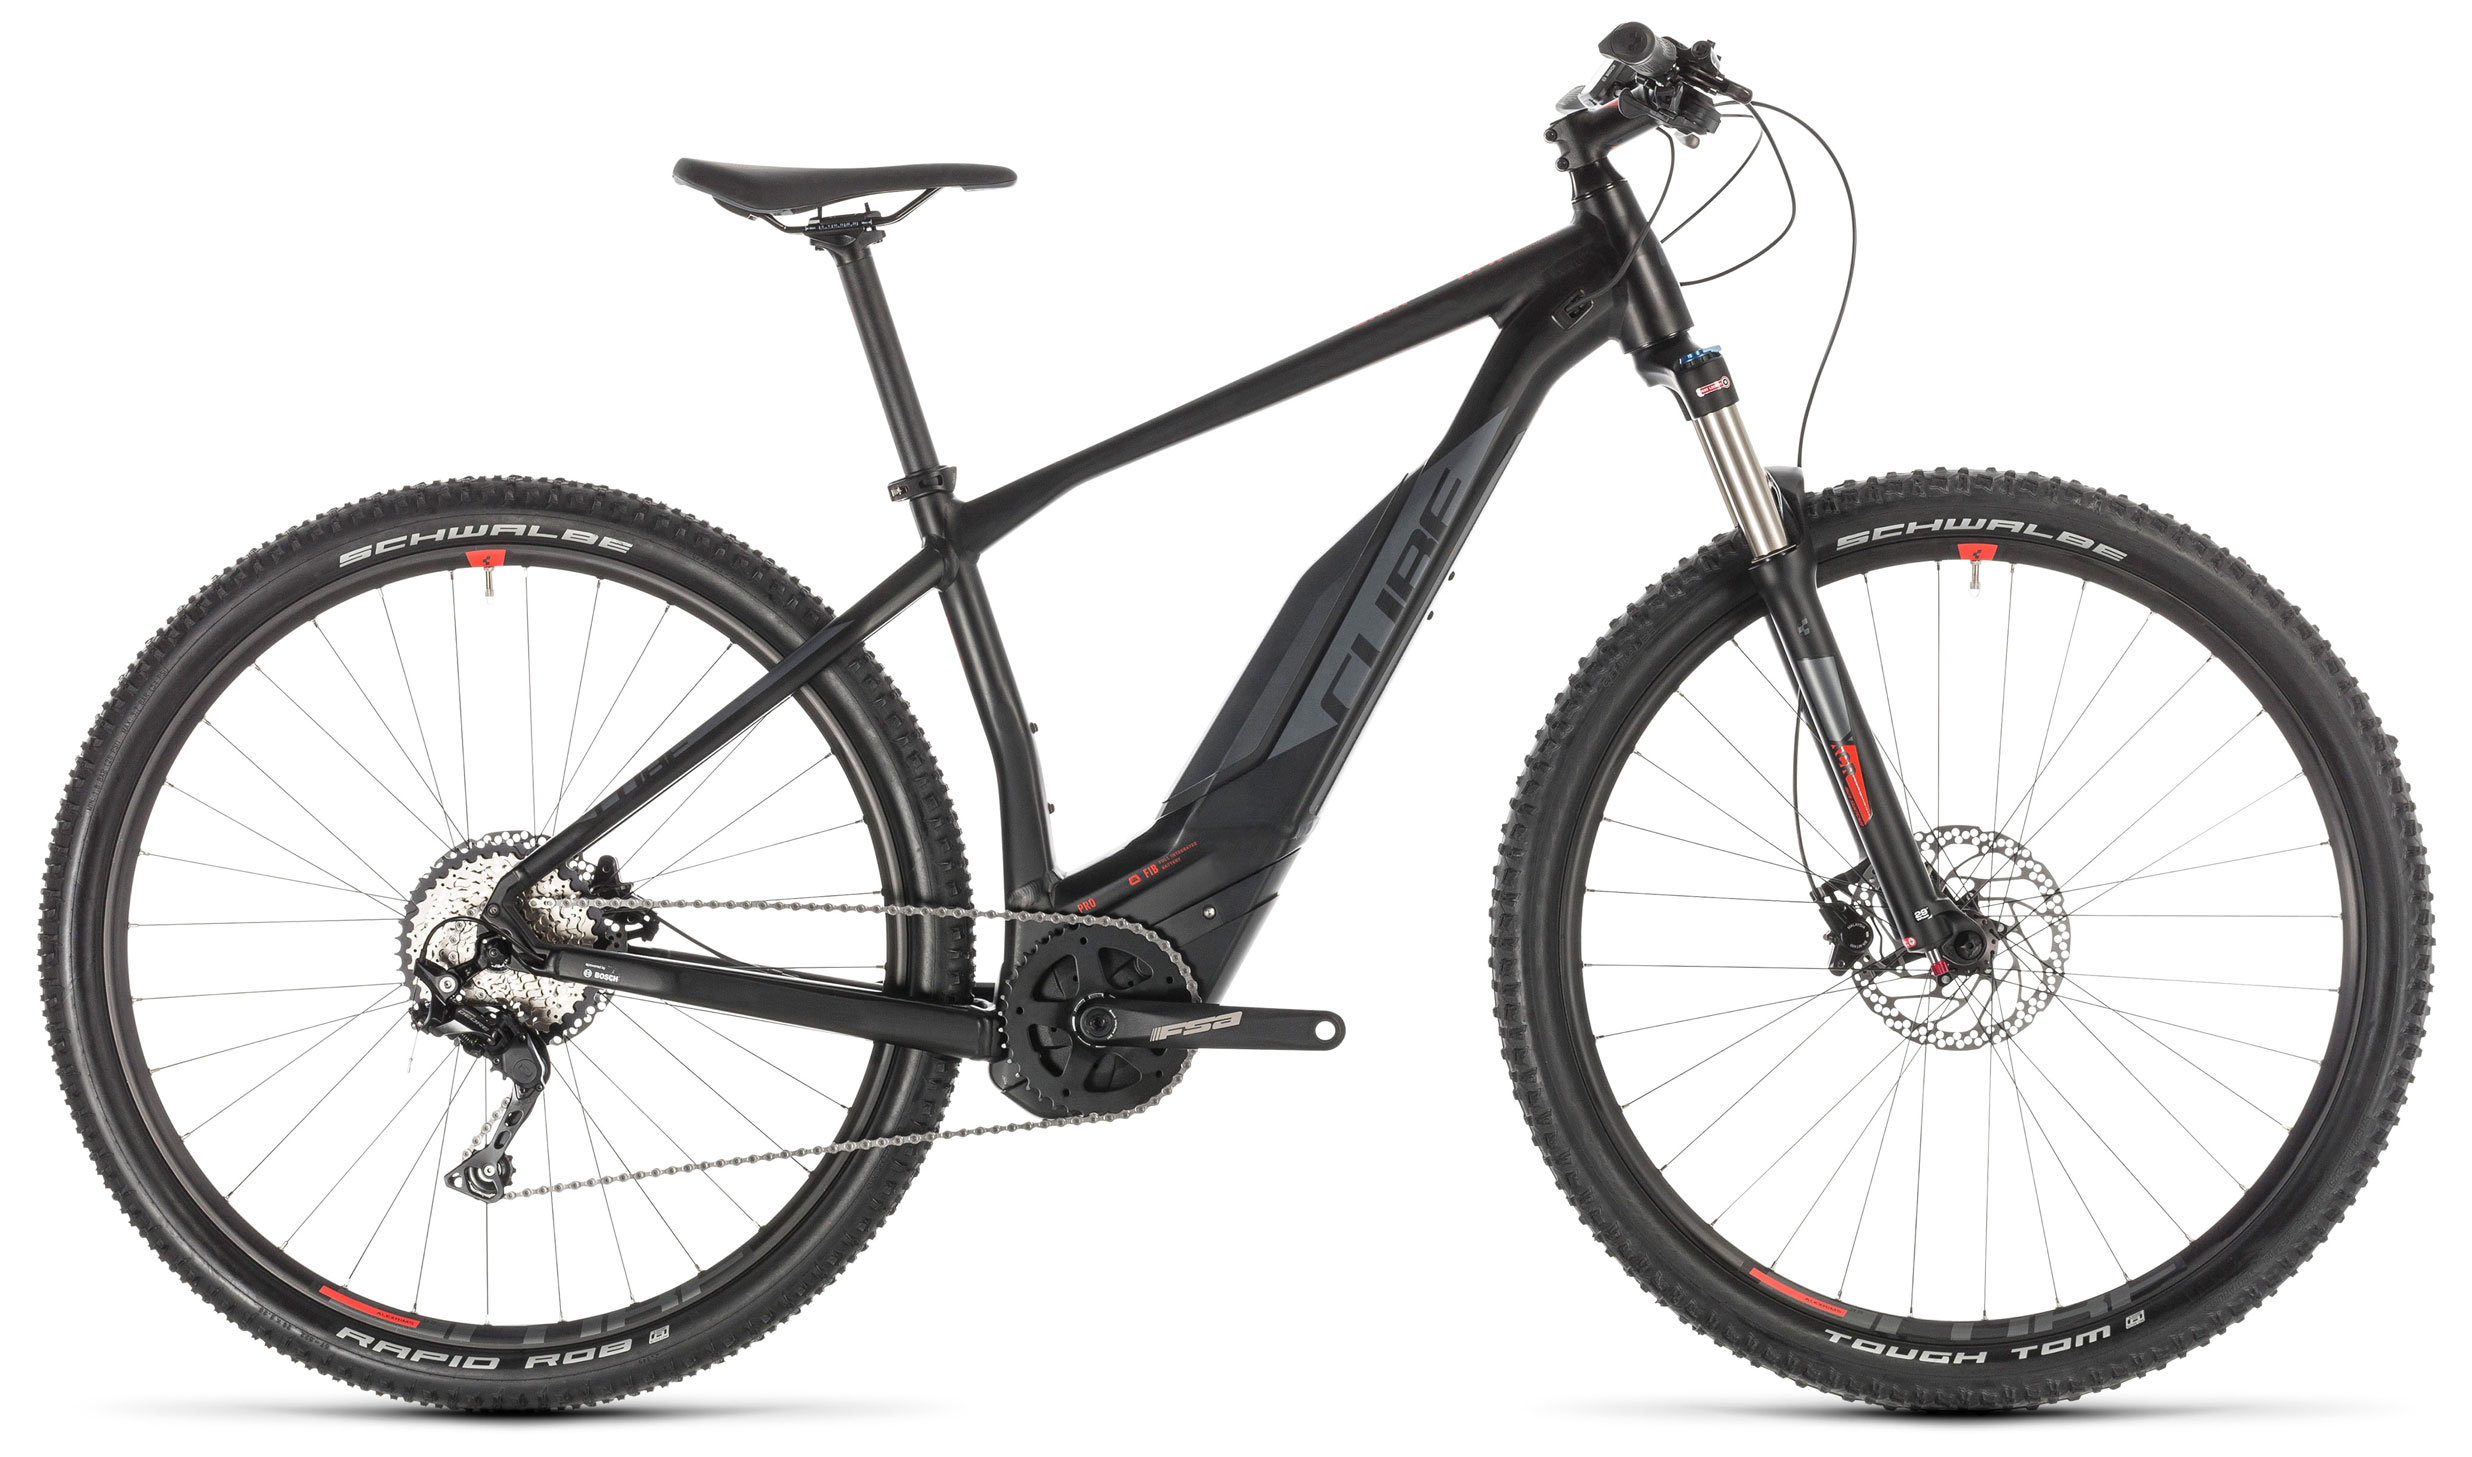 Велосипед Cube Acid Hybrid Pro 400 29 2019 велосипед cube agree gtc pro 2015